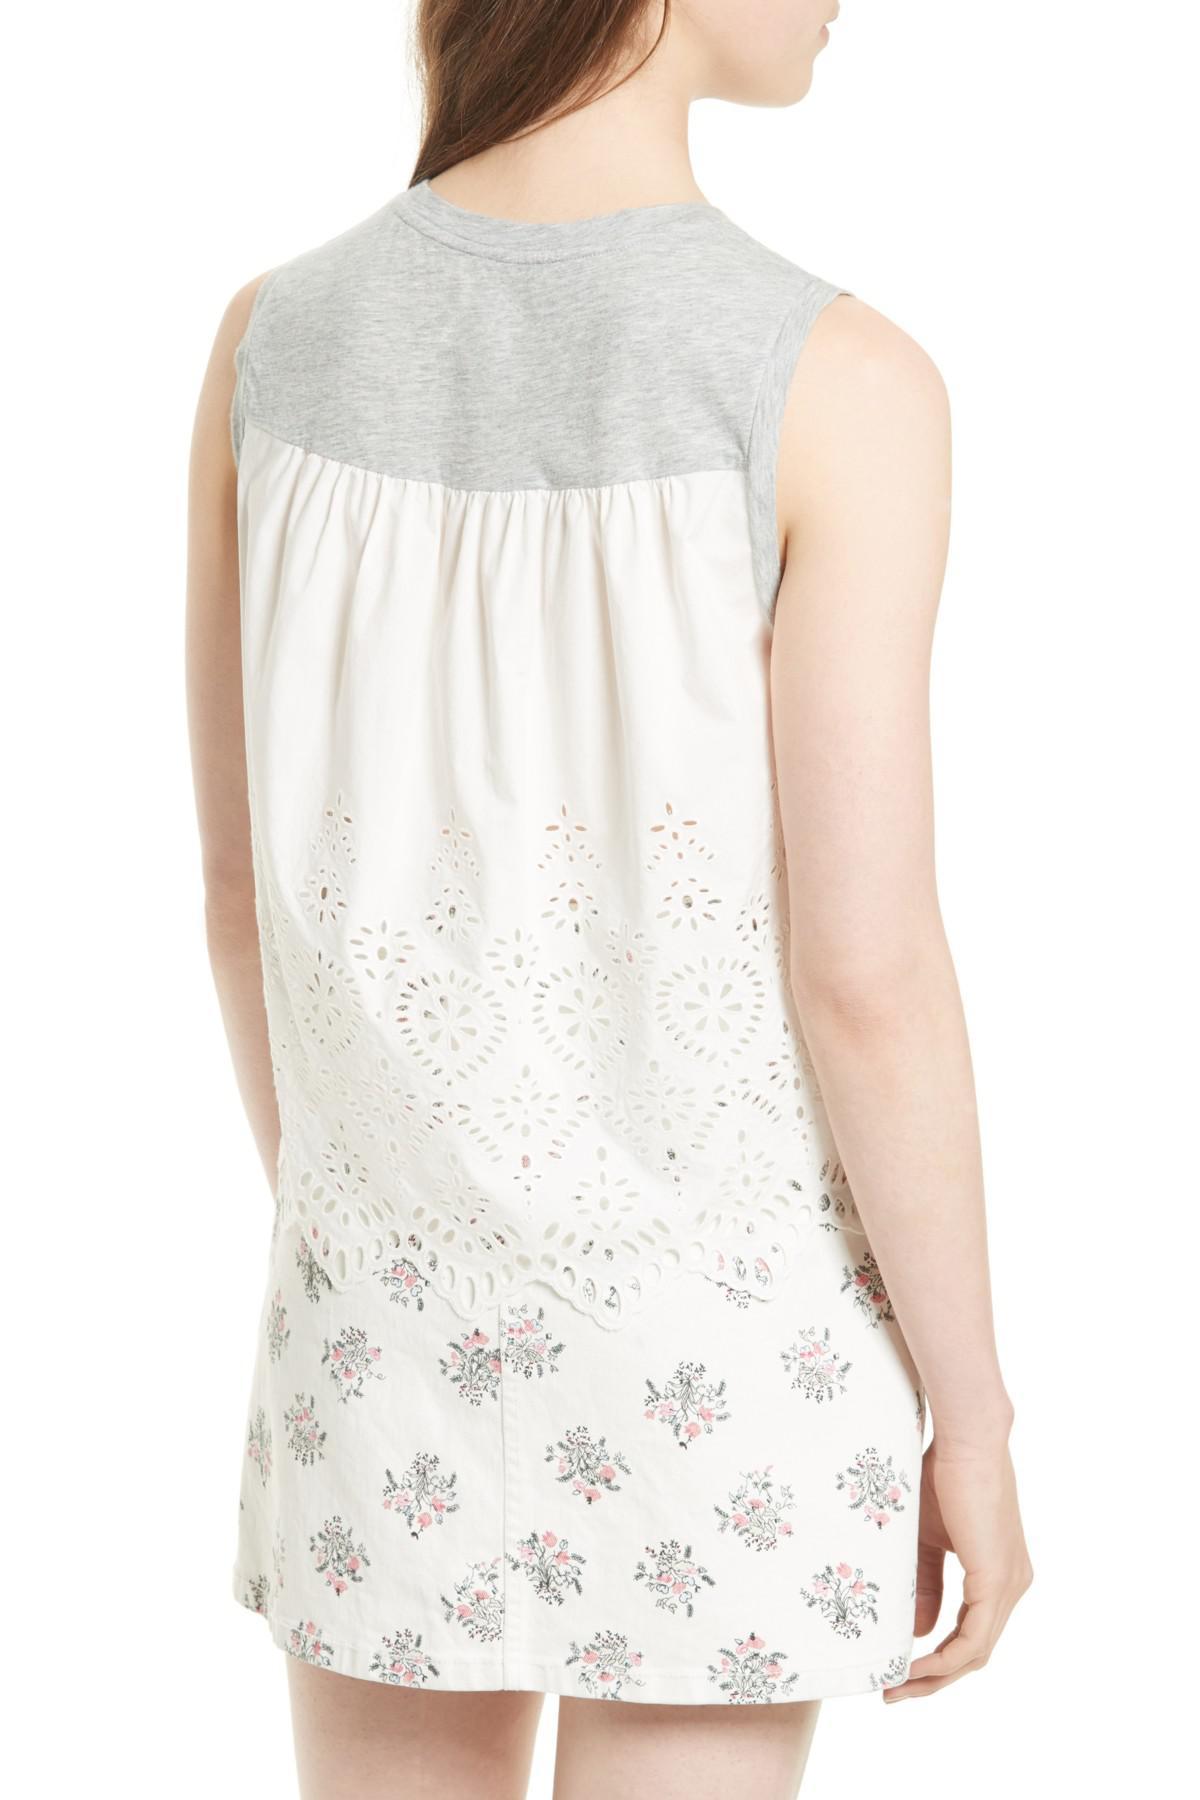 60897555e00 Lyst - La Vie Rebecca Taylor Jersey   Eyelet Top in White